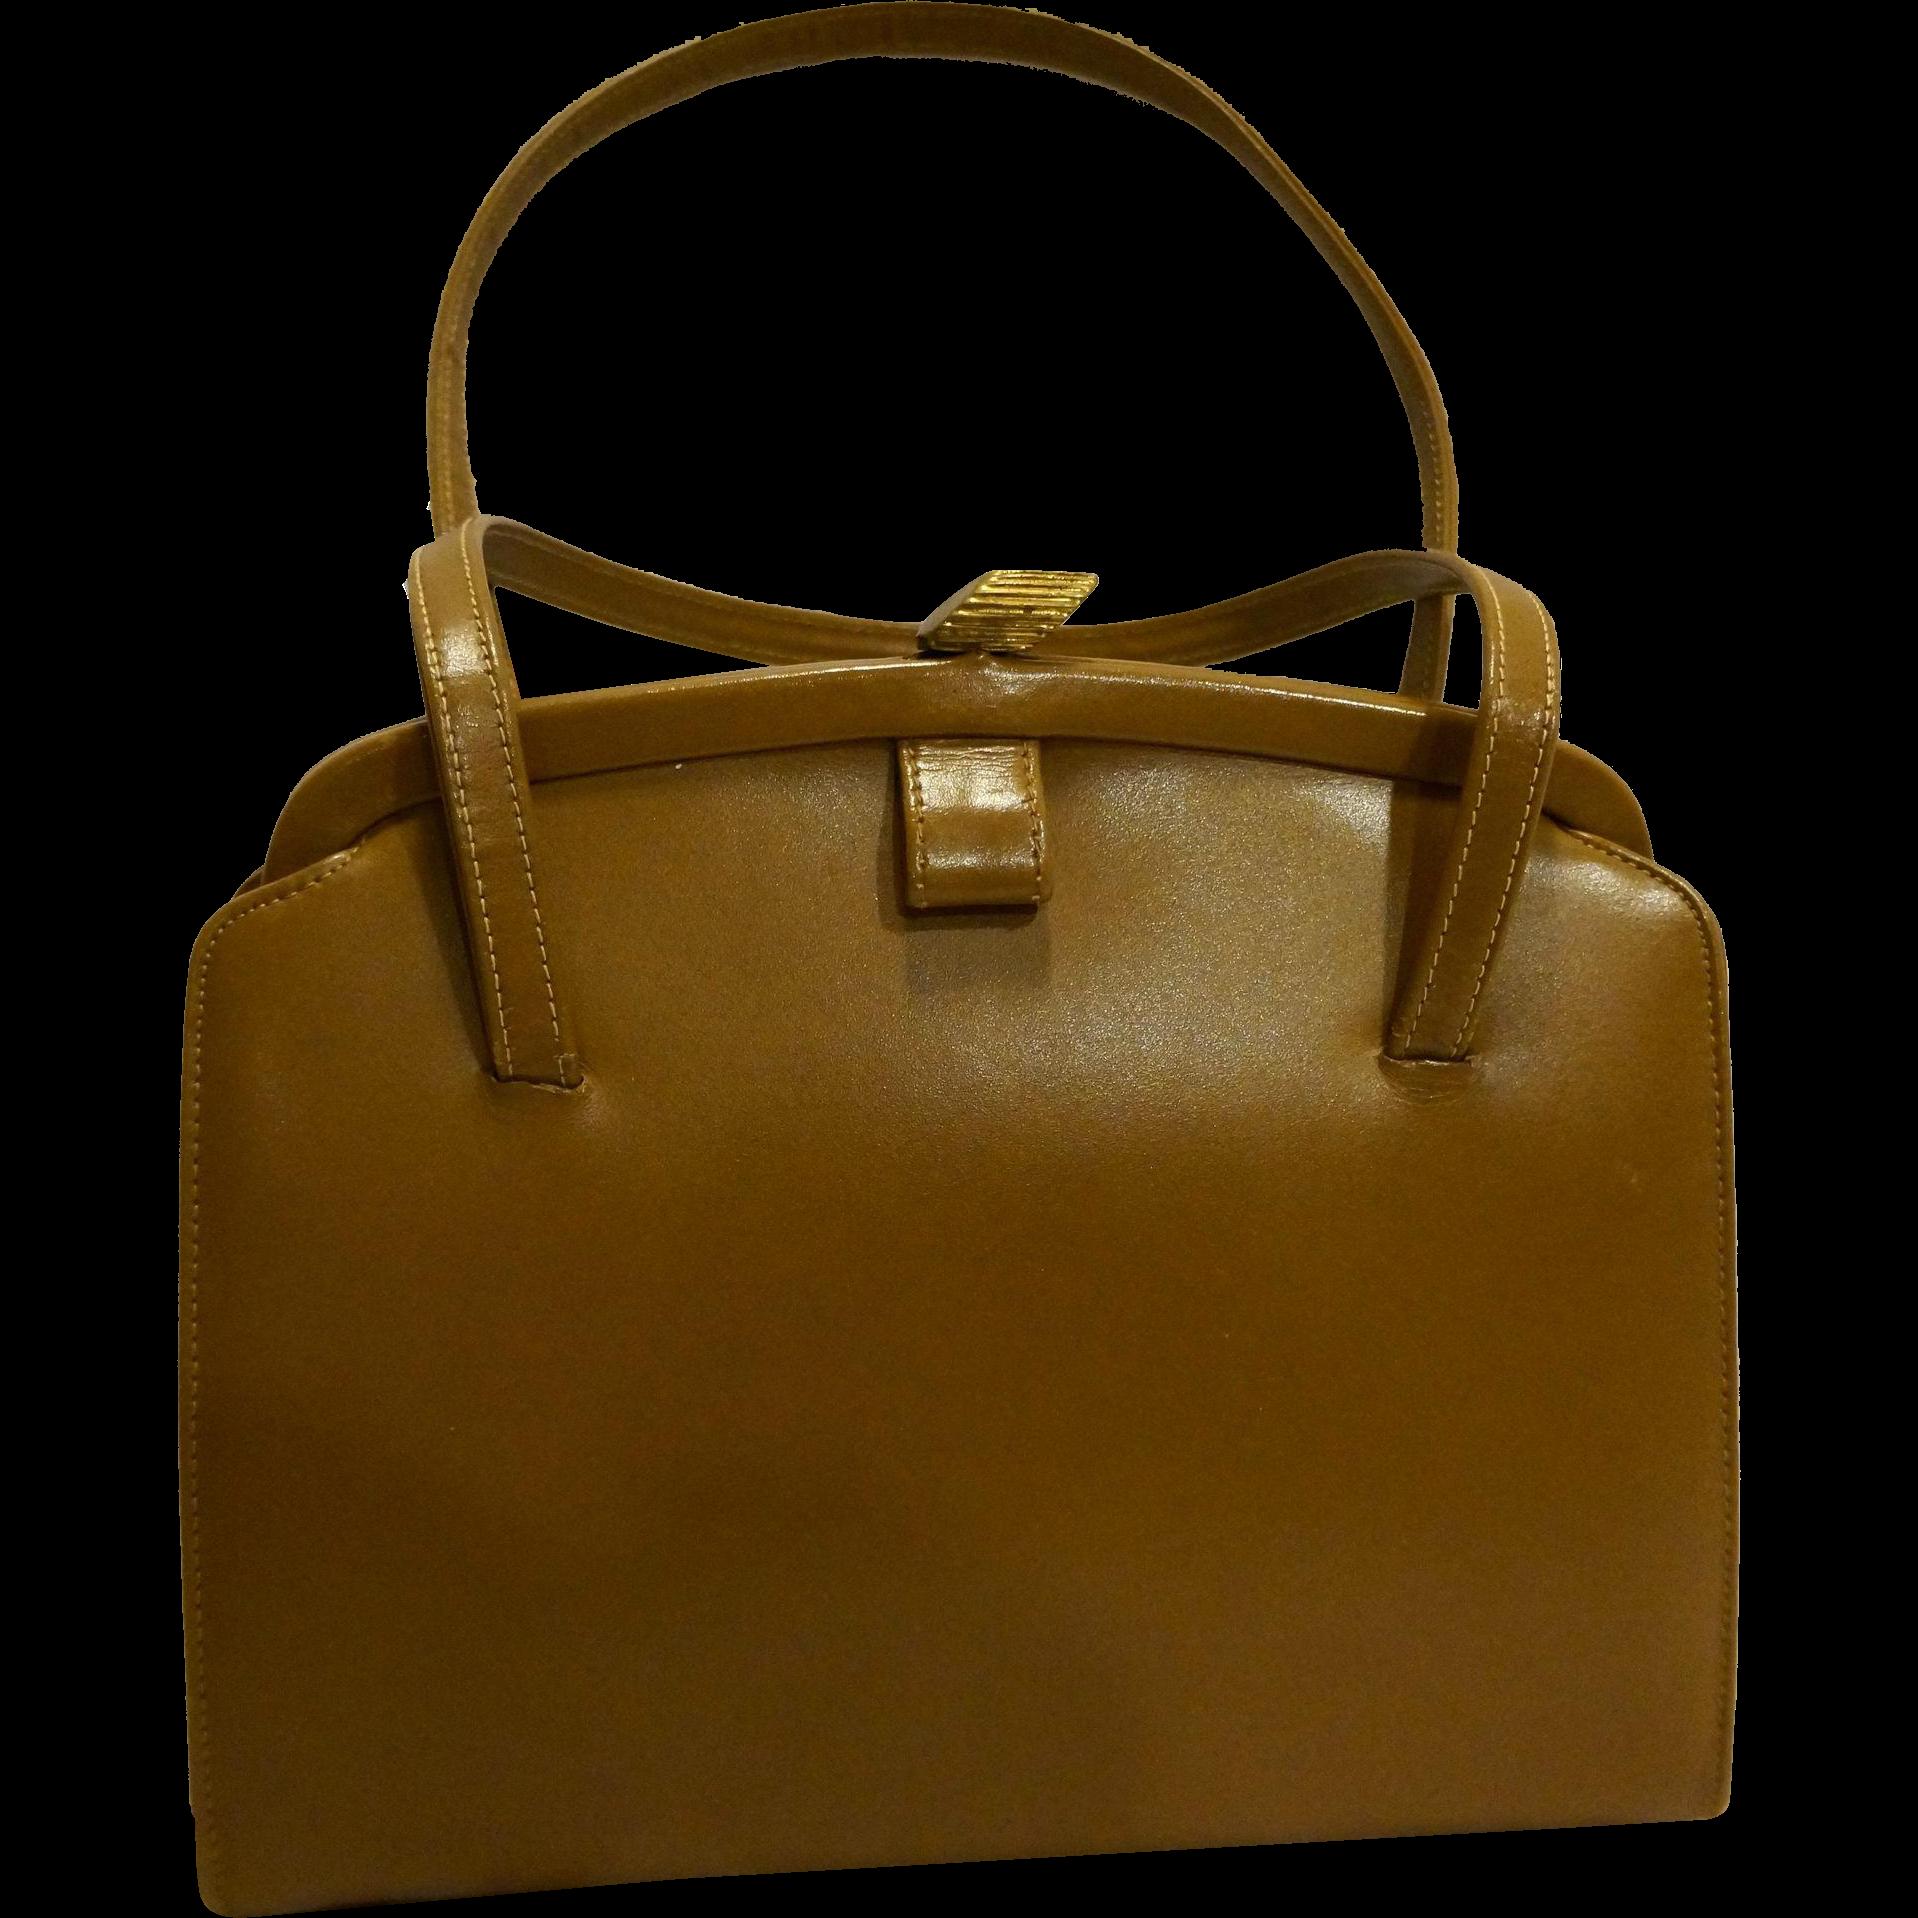 Brown Vinyl Vintage Structured Handbag Purse